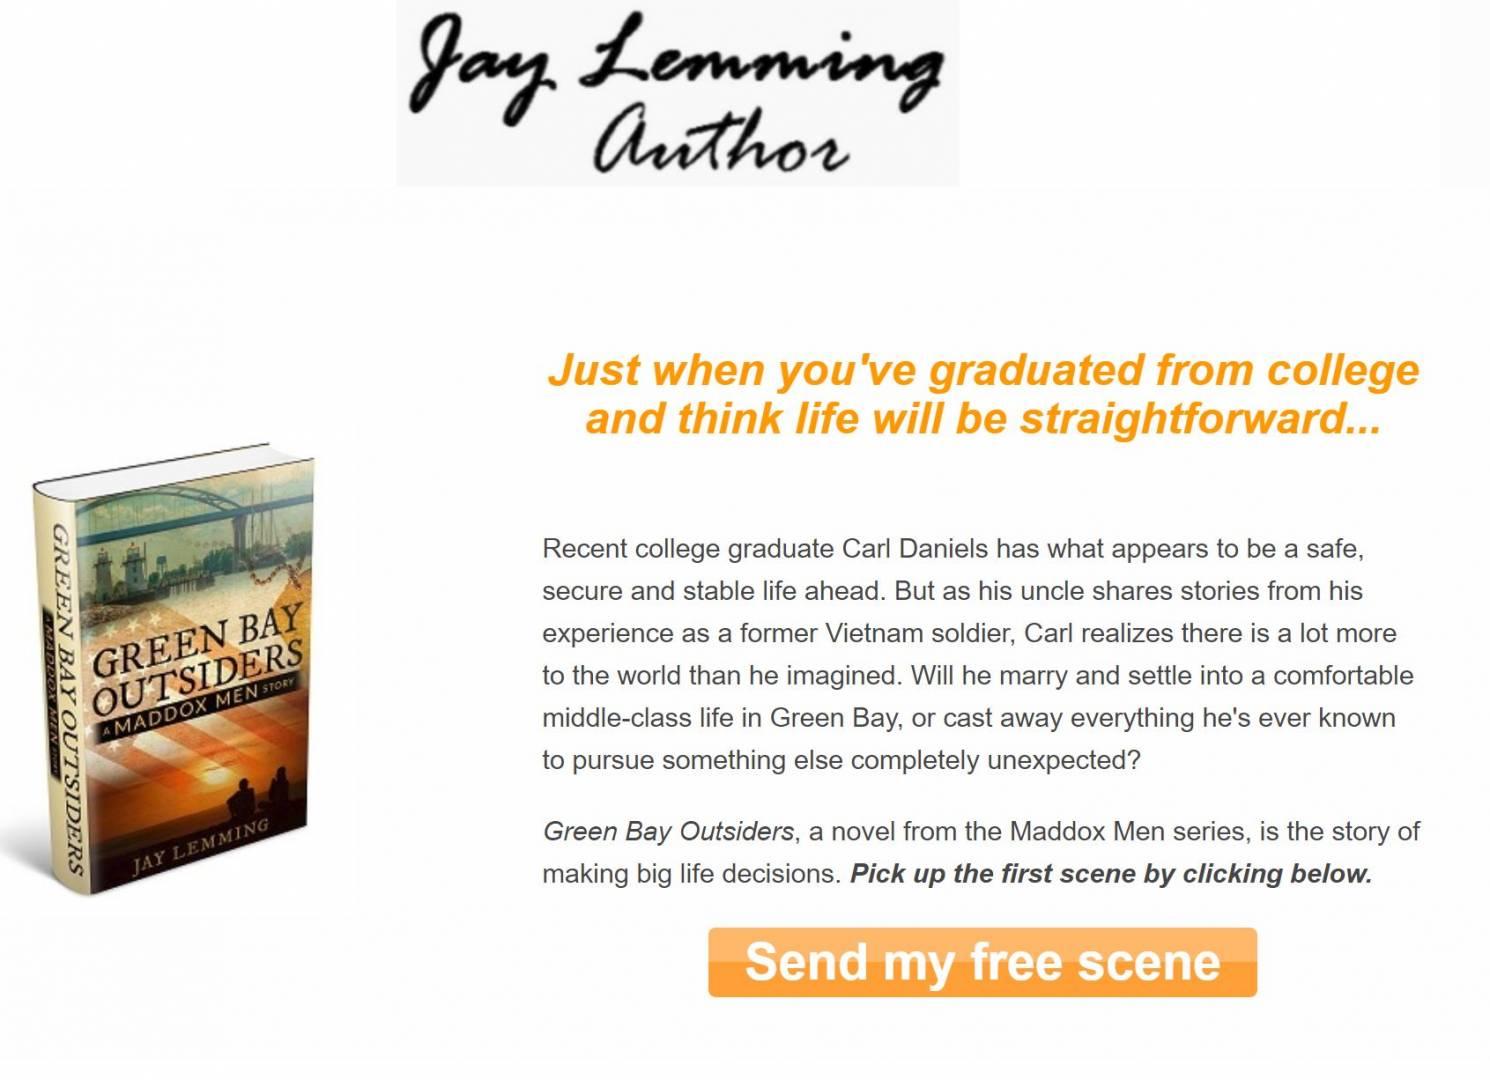 Jay Lemming's Landing Page